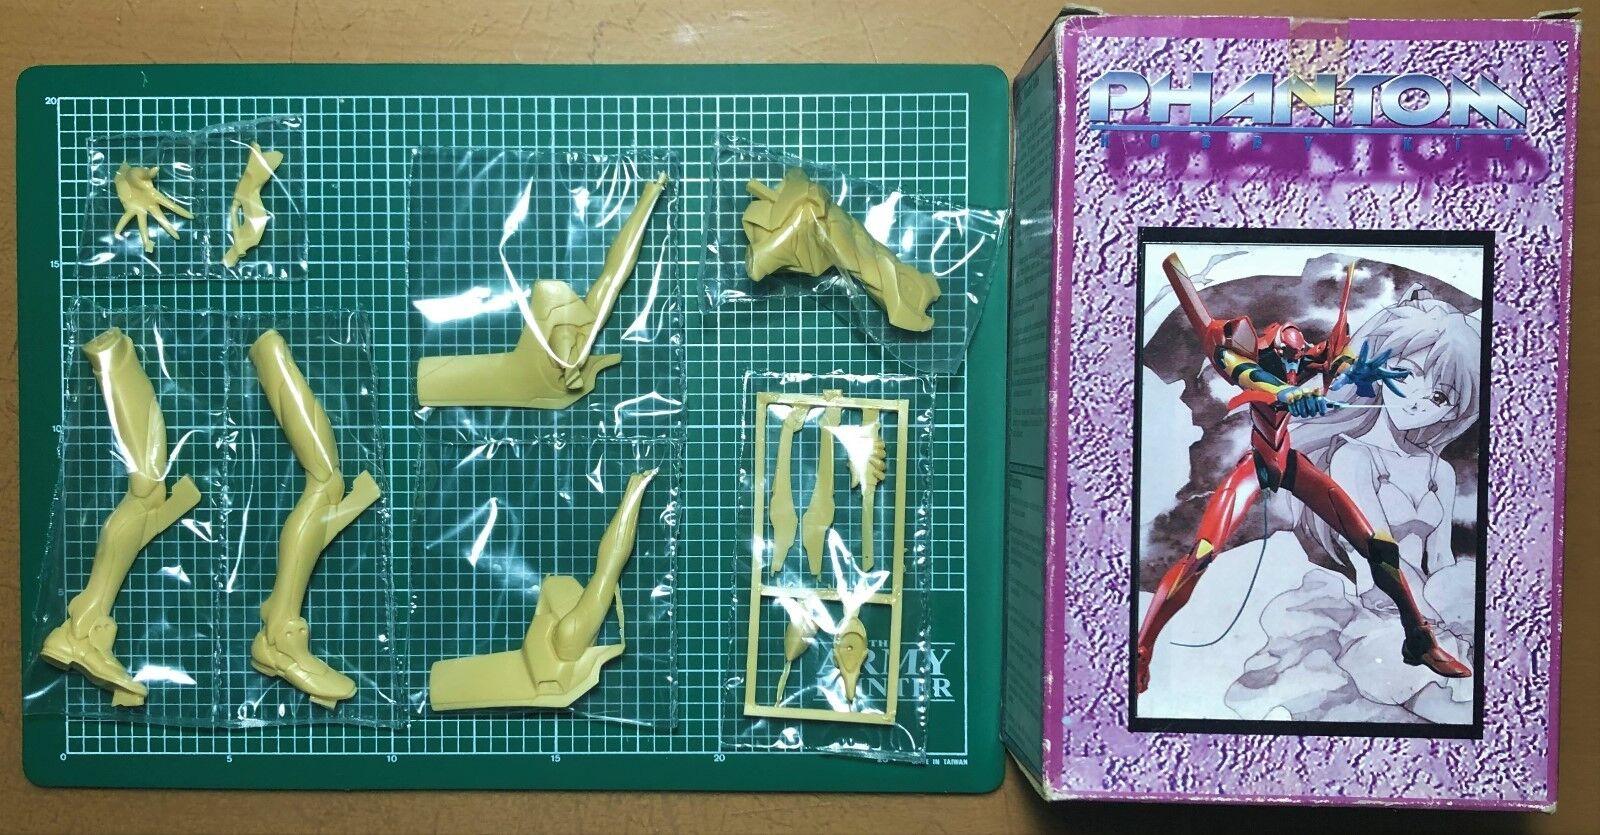 ELFIN MODEL - EVANGELION EVA 02 - NO SCALE RESIN KIT